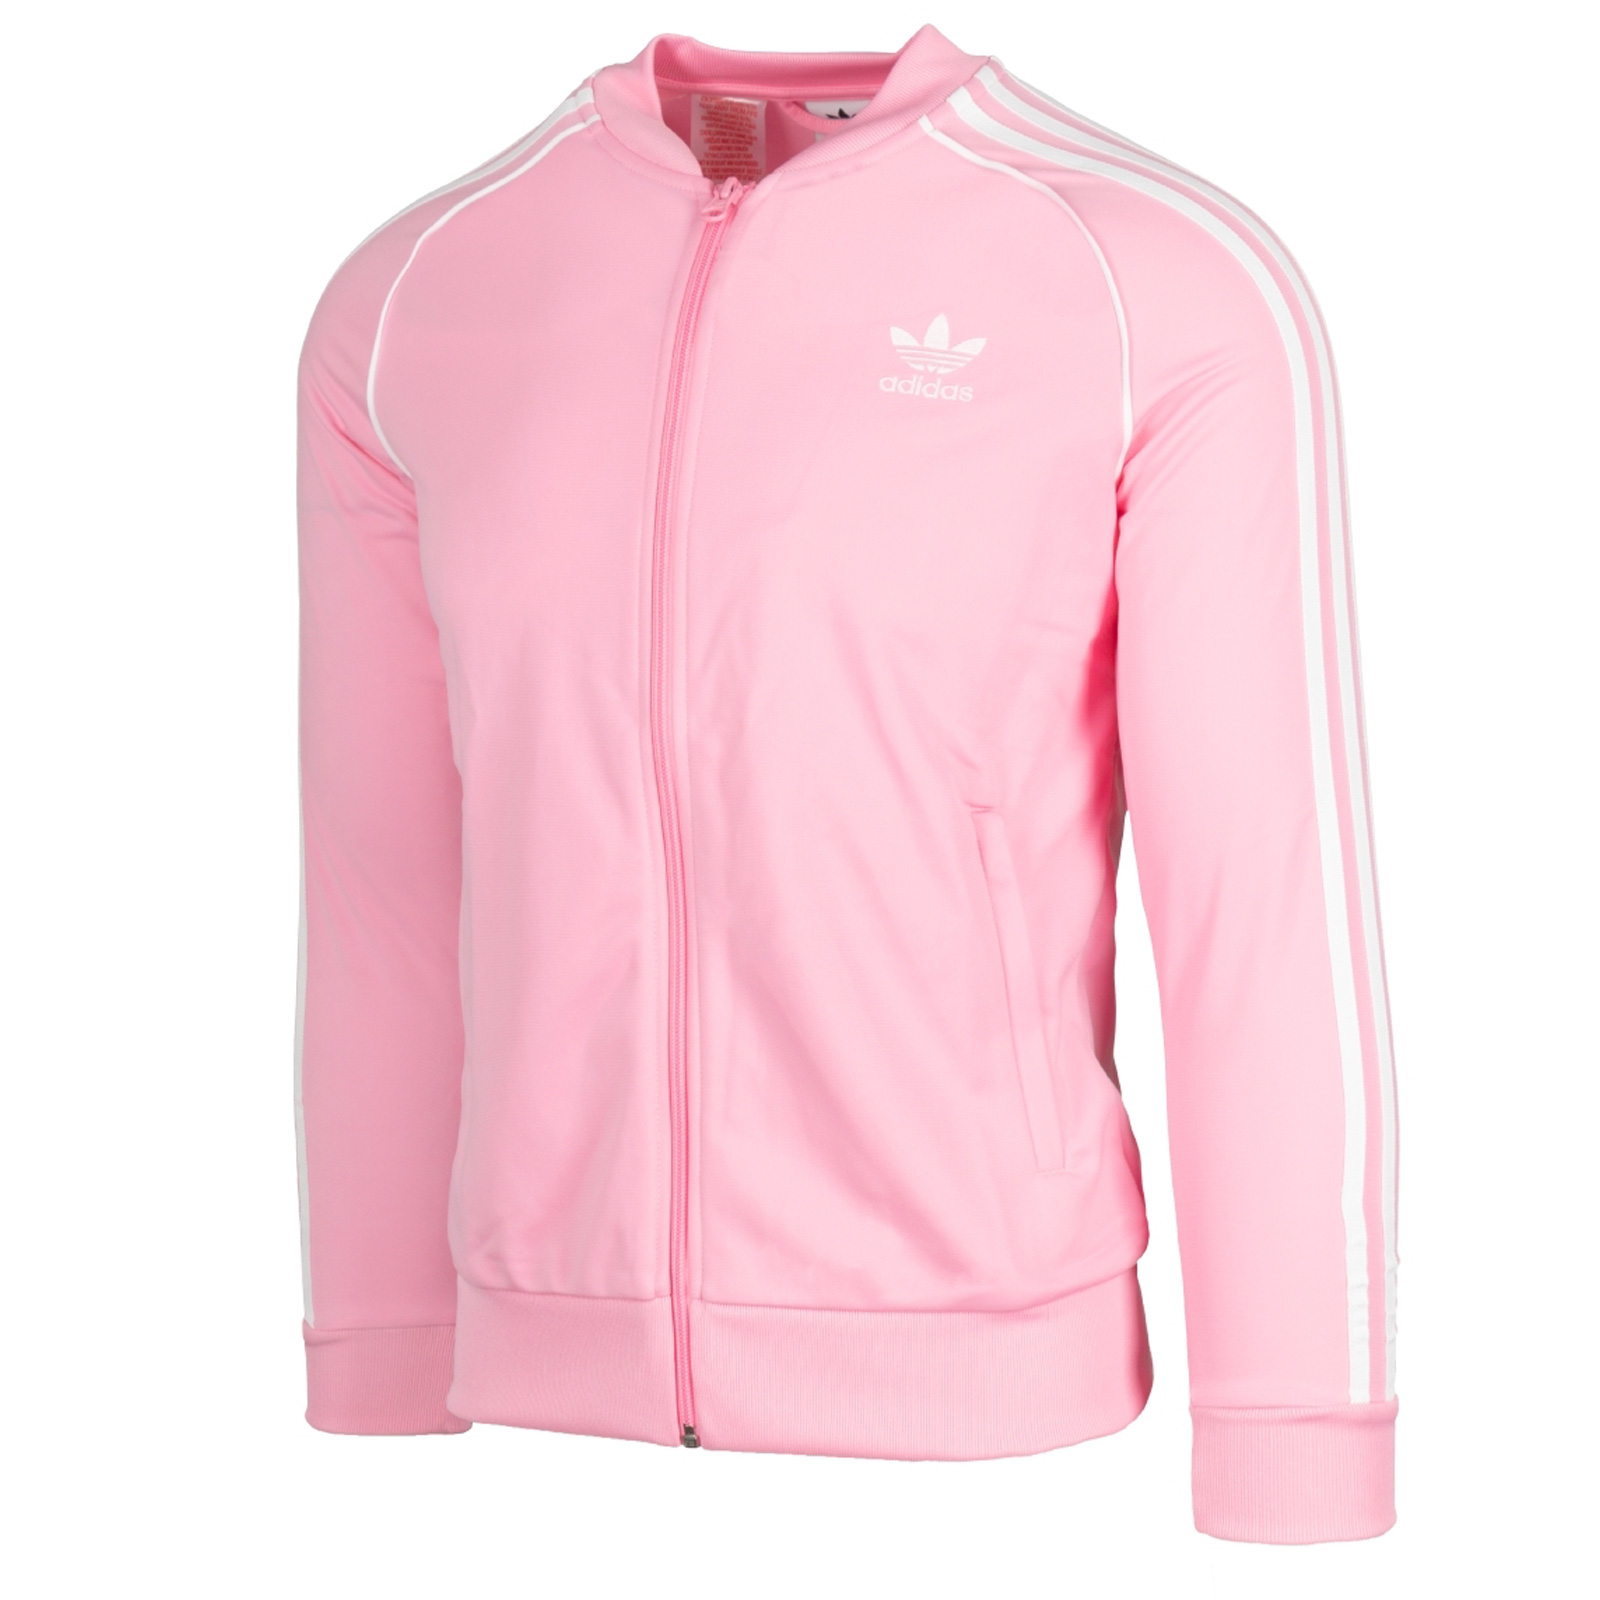 Details about Adidas Children's Girl's Superstar Tt Sweater Jacket Sports Training Pink